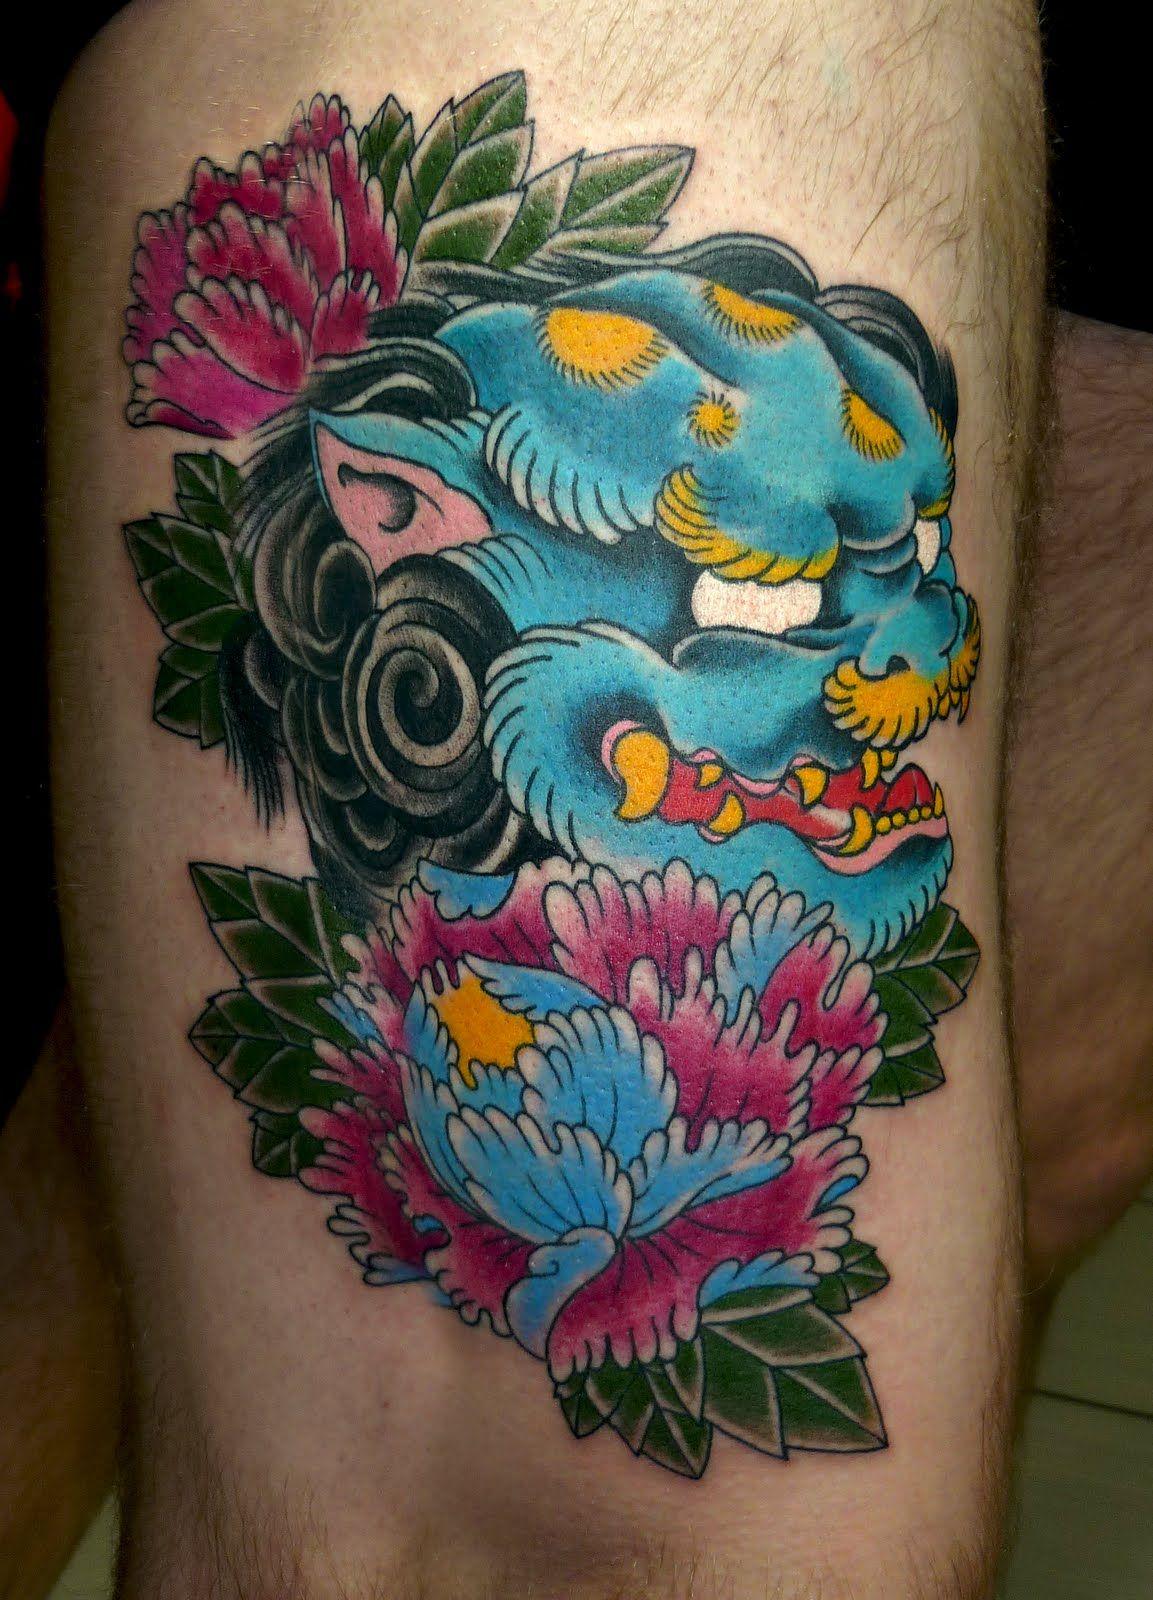 Japanese Foo Dogs Cake Ideas And Designs Foo Dog Tattoo Hund Tattoo Ideen Hundetattoo